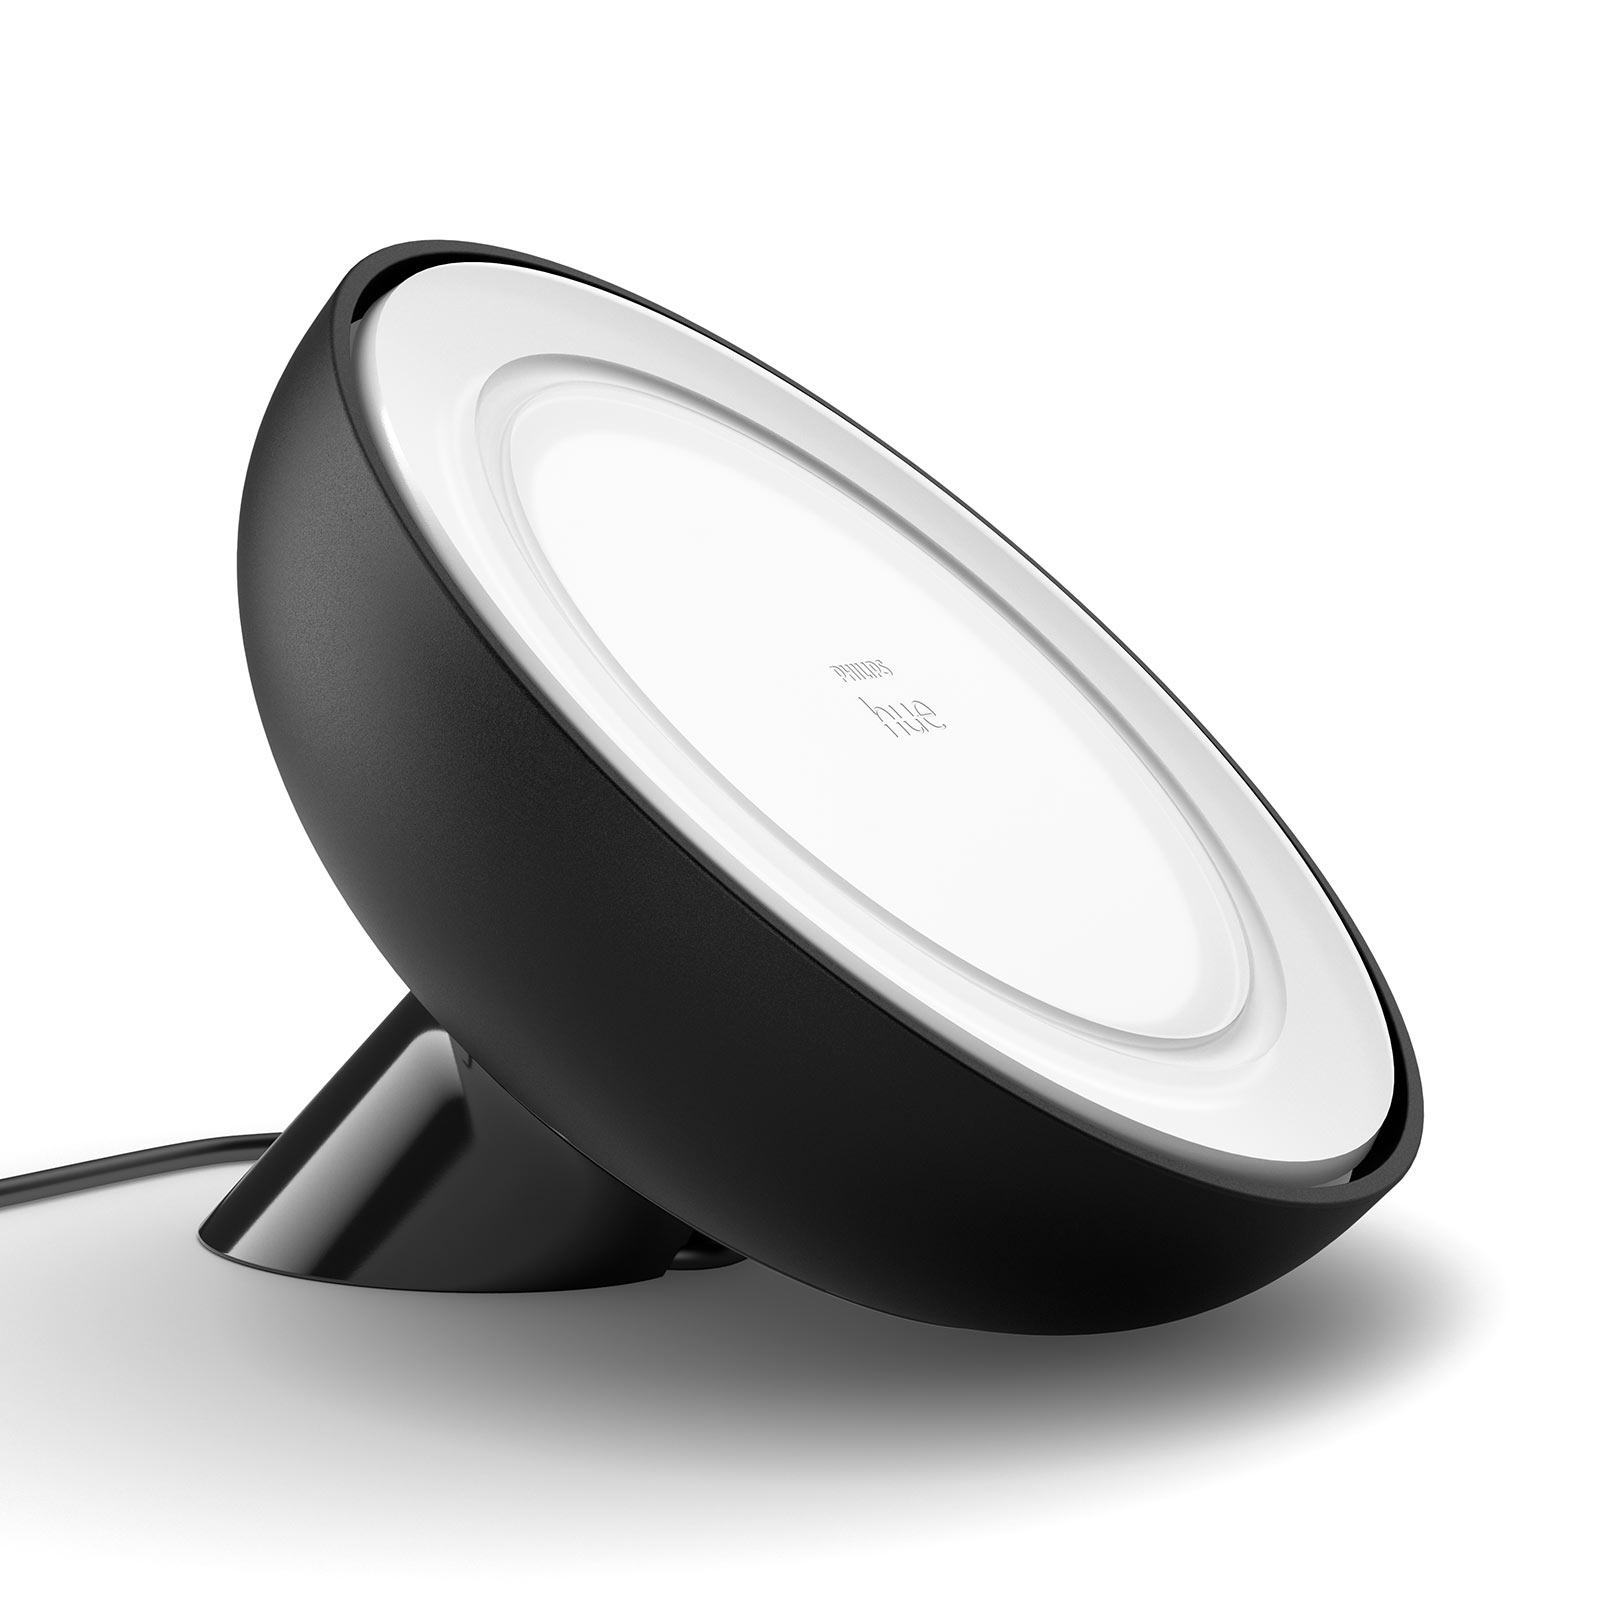 Philips Hue Bloom Tischlampe schwarz white & color